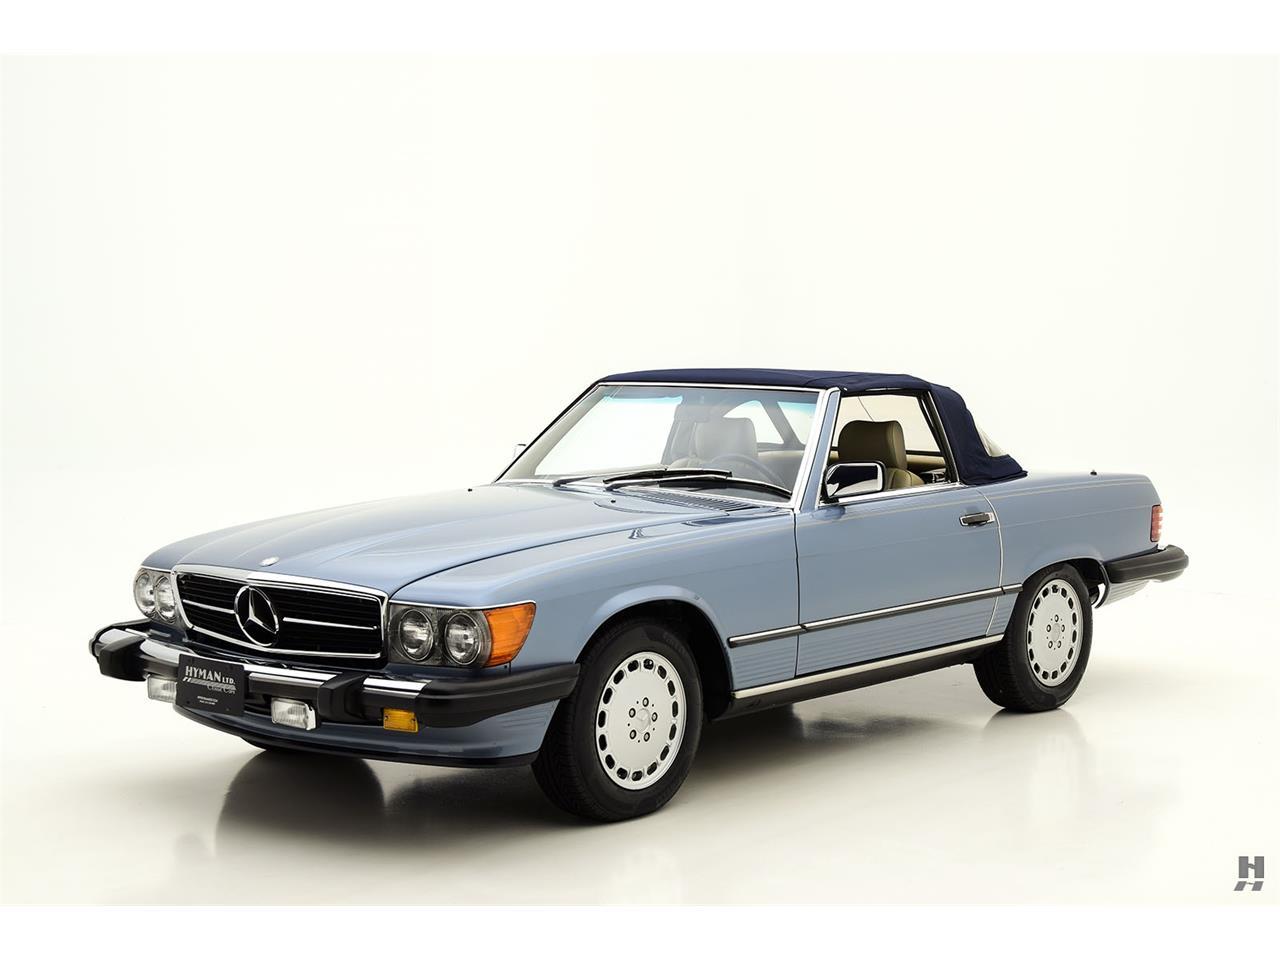 Large Picture of 1987 Mercedes-Benz 560SL located in Saint Louis Missouri - $48,500.00 - LENL